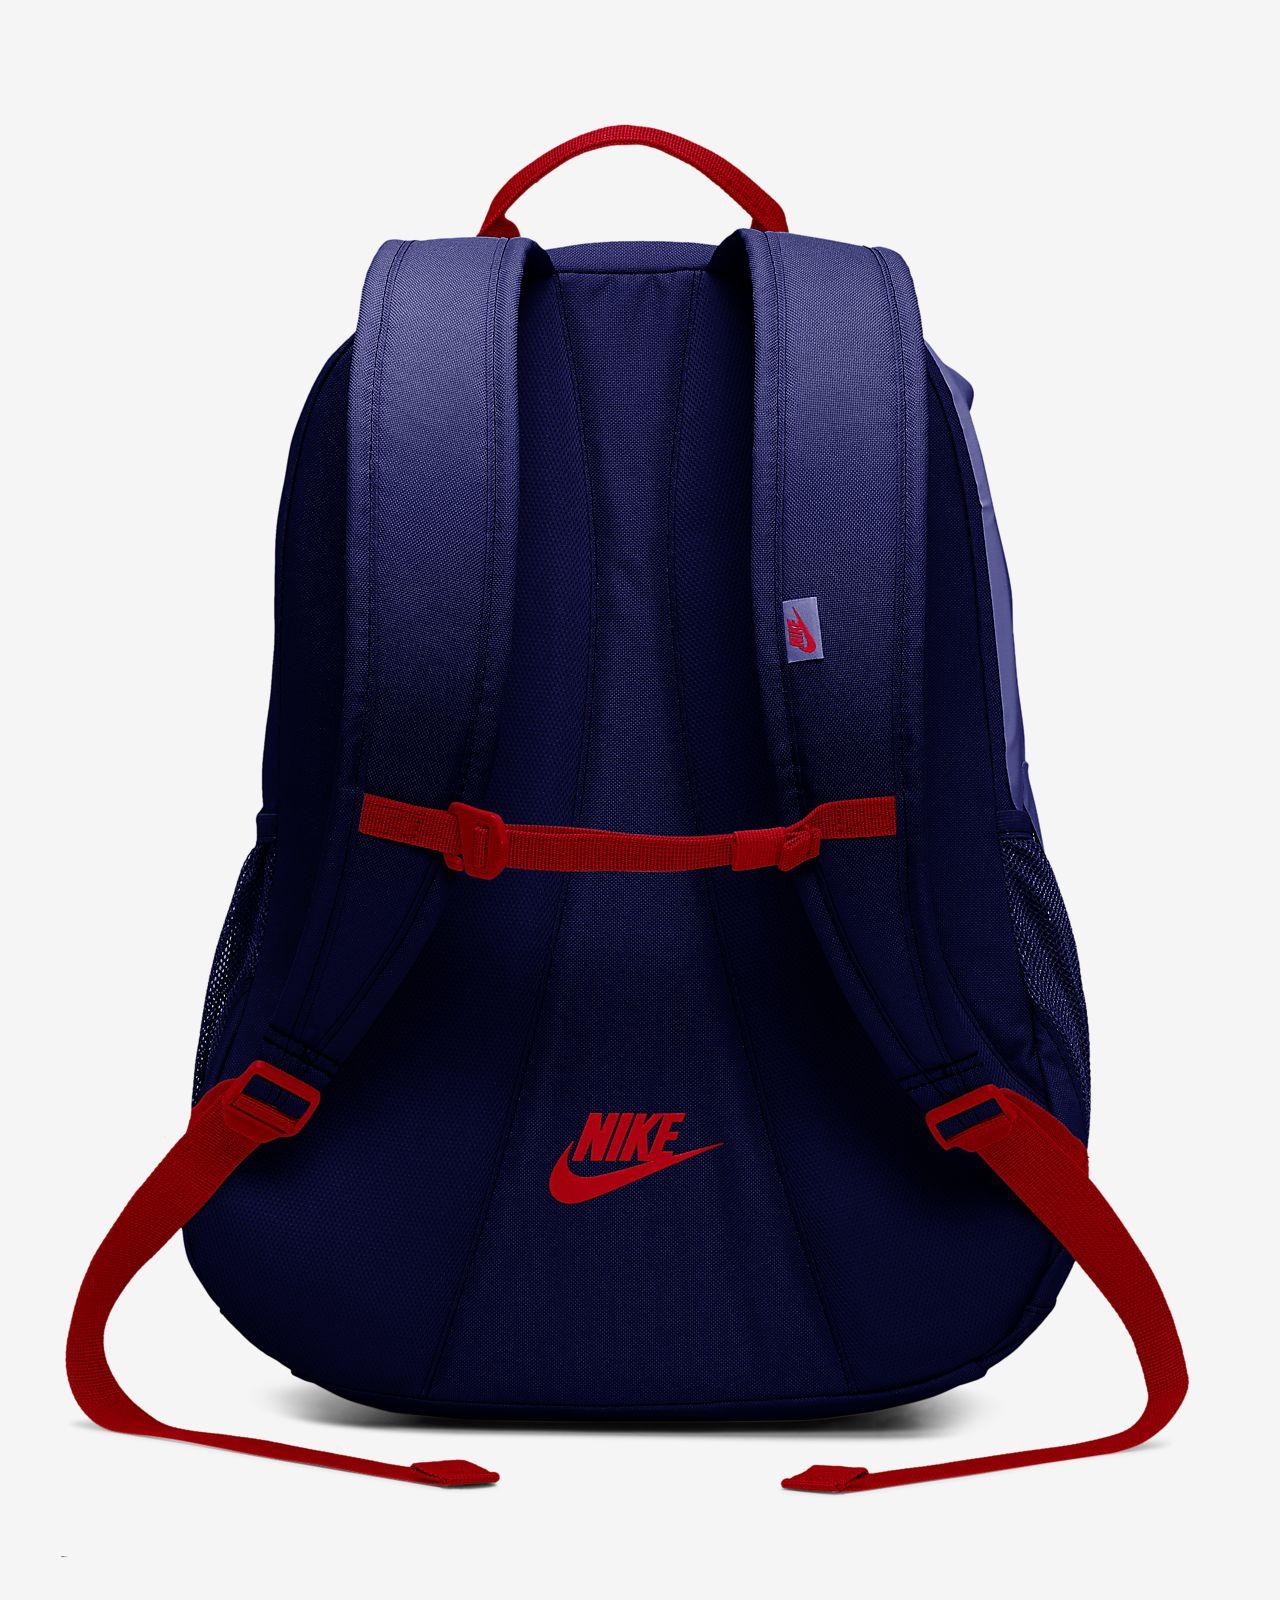 low cost c8f01 7977e ... Nike Sportswear Hayward Futura 2.0 Backpack